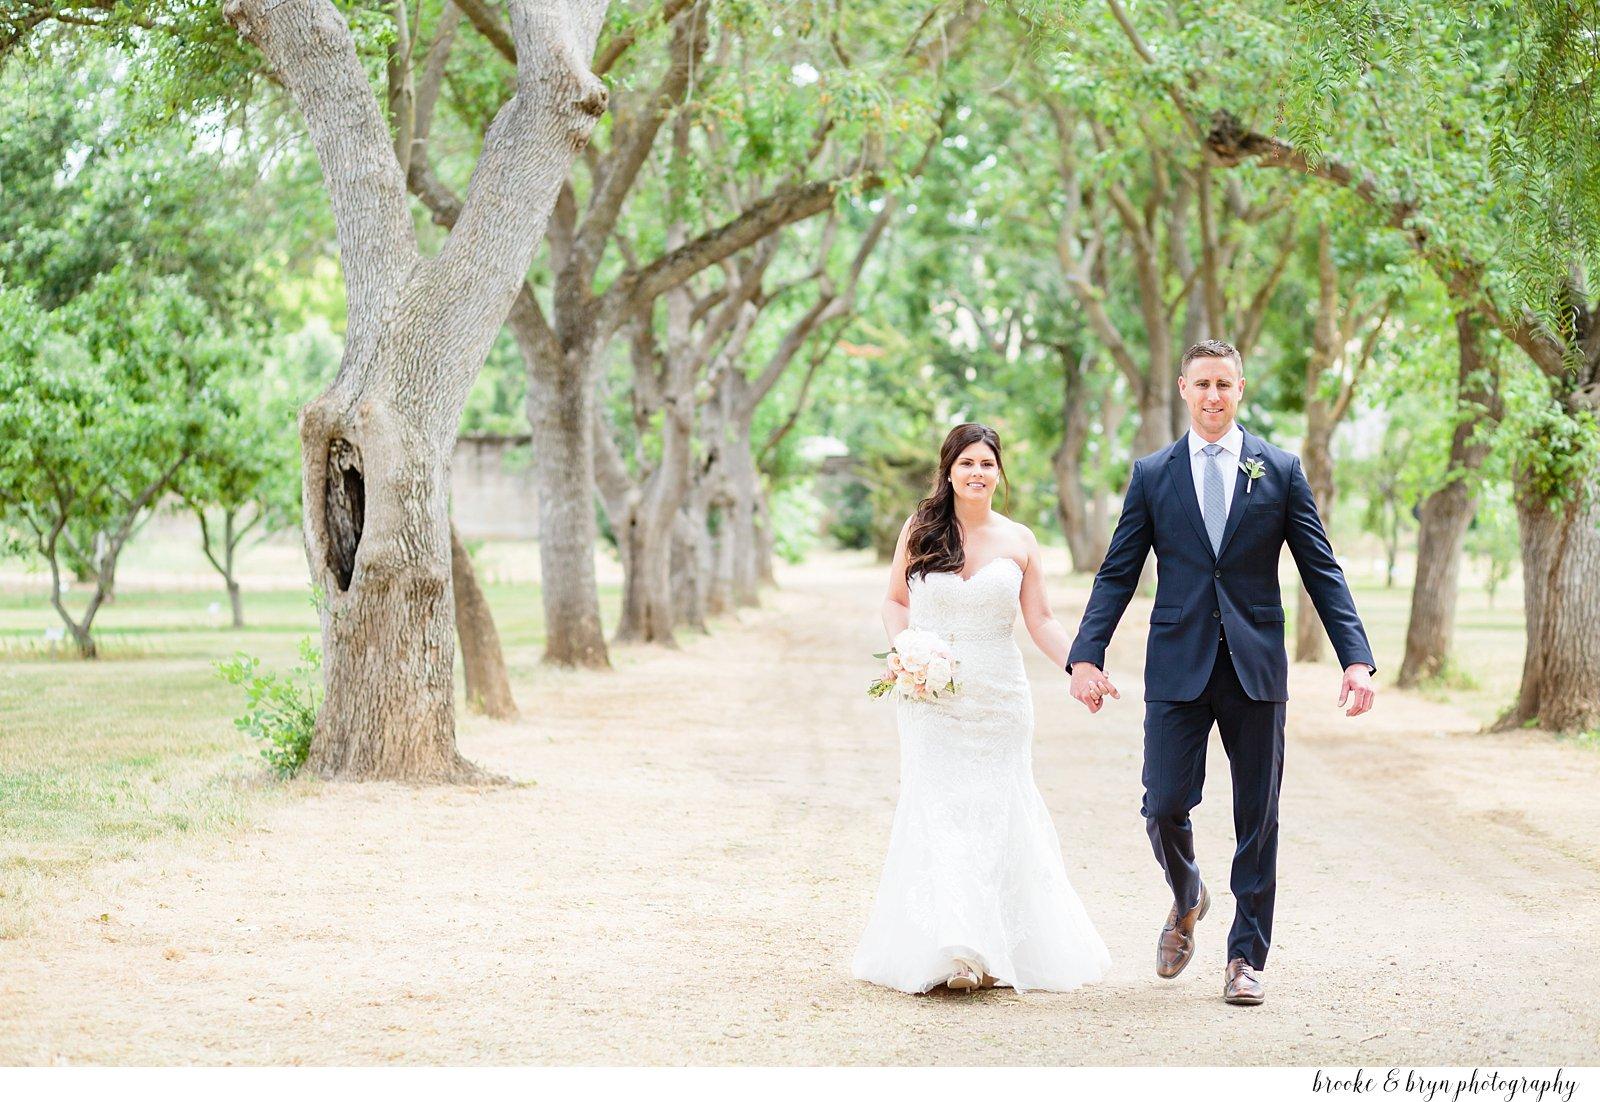 Concannon Winery Wedding, Livermore Wedding Photographers, Livermore Wedding, Concannon Wedding, Concannon Wedding Photographers